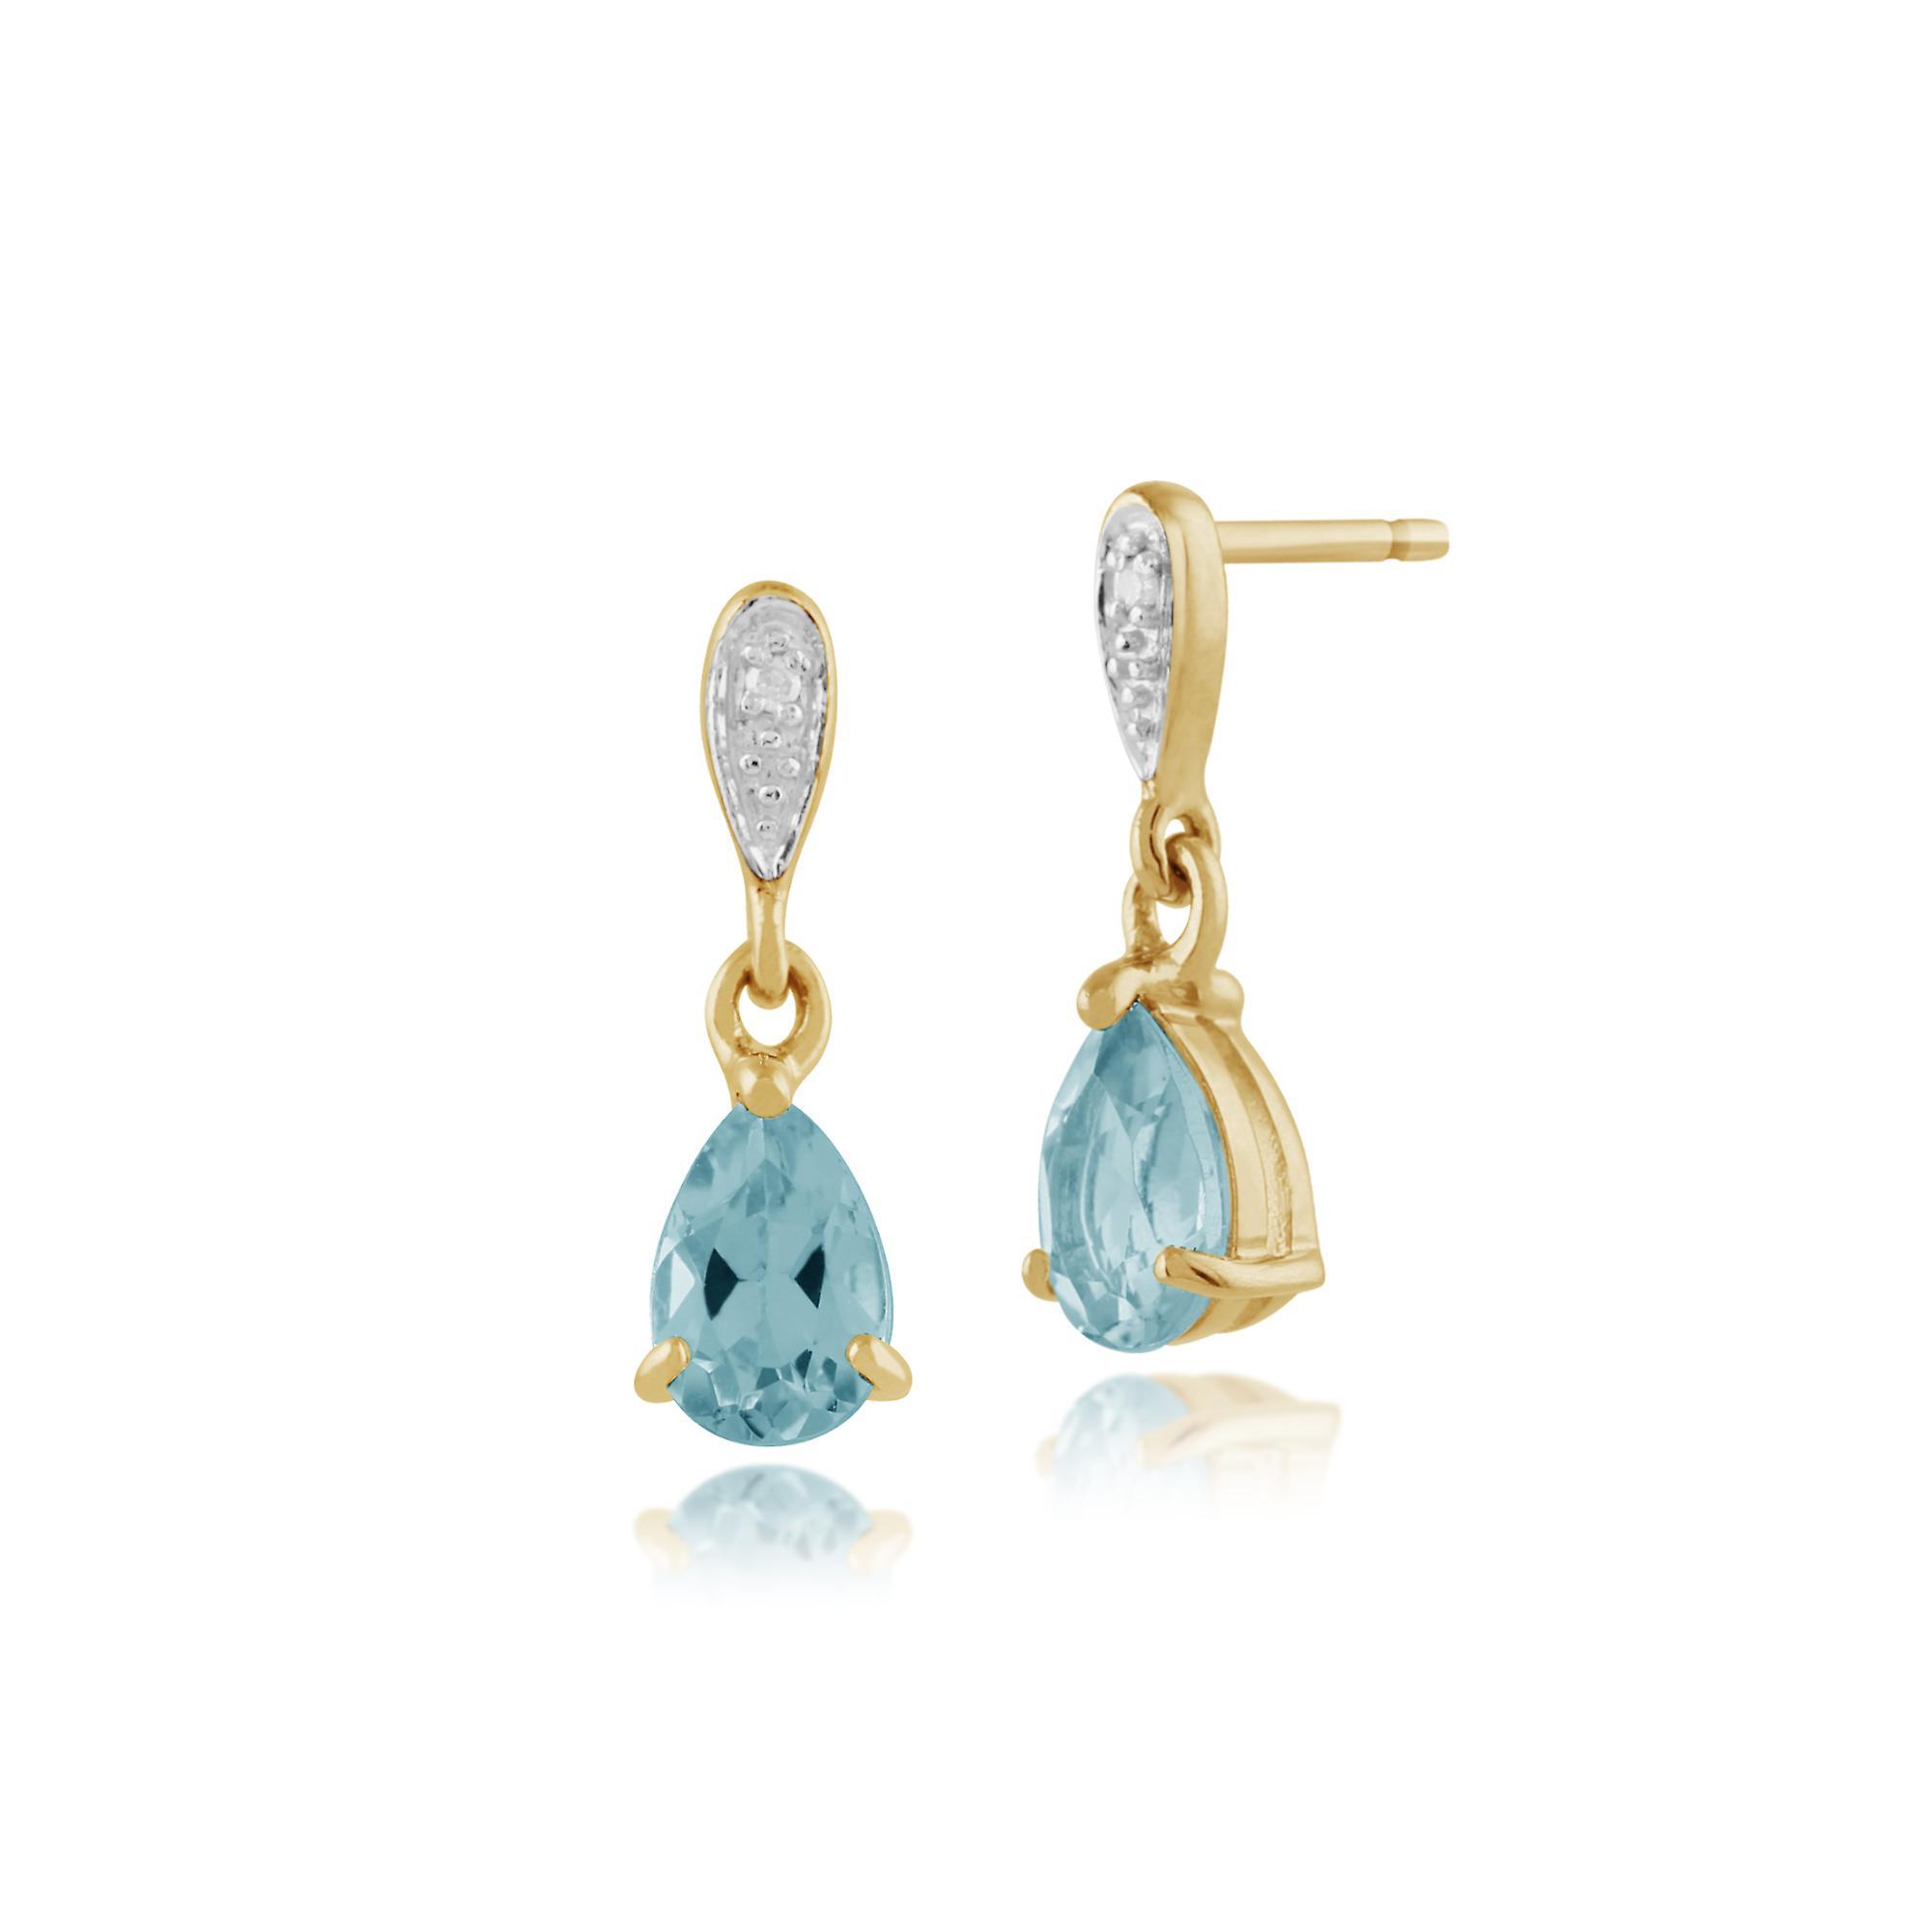 Gemondo 9ct Yellow Gold 1.04ct Blue Topaz & Diamond Drop Earrings